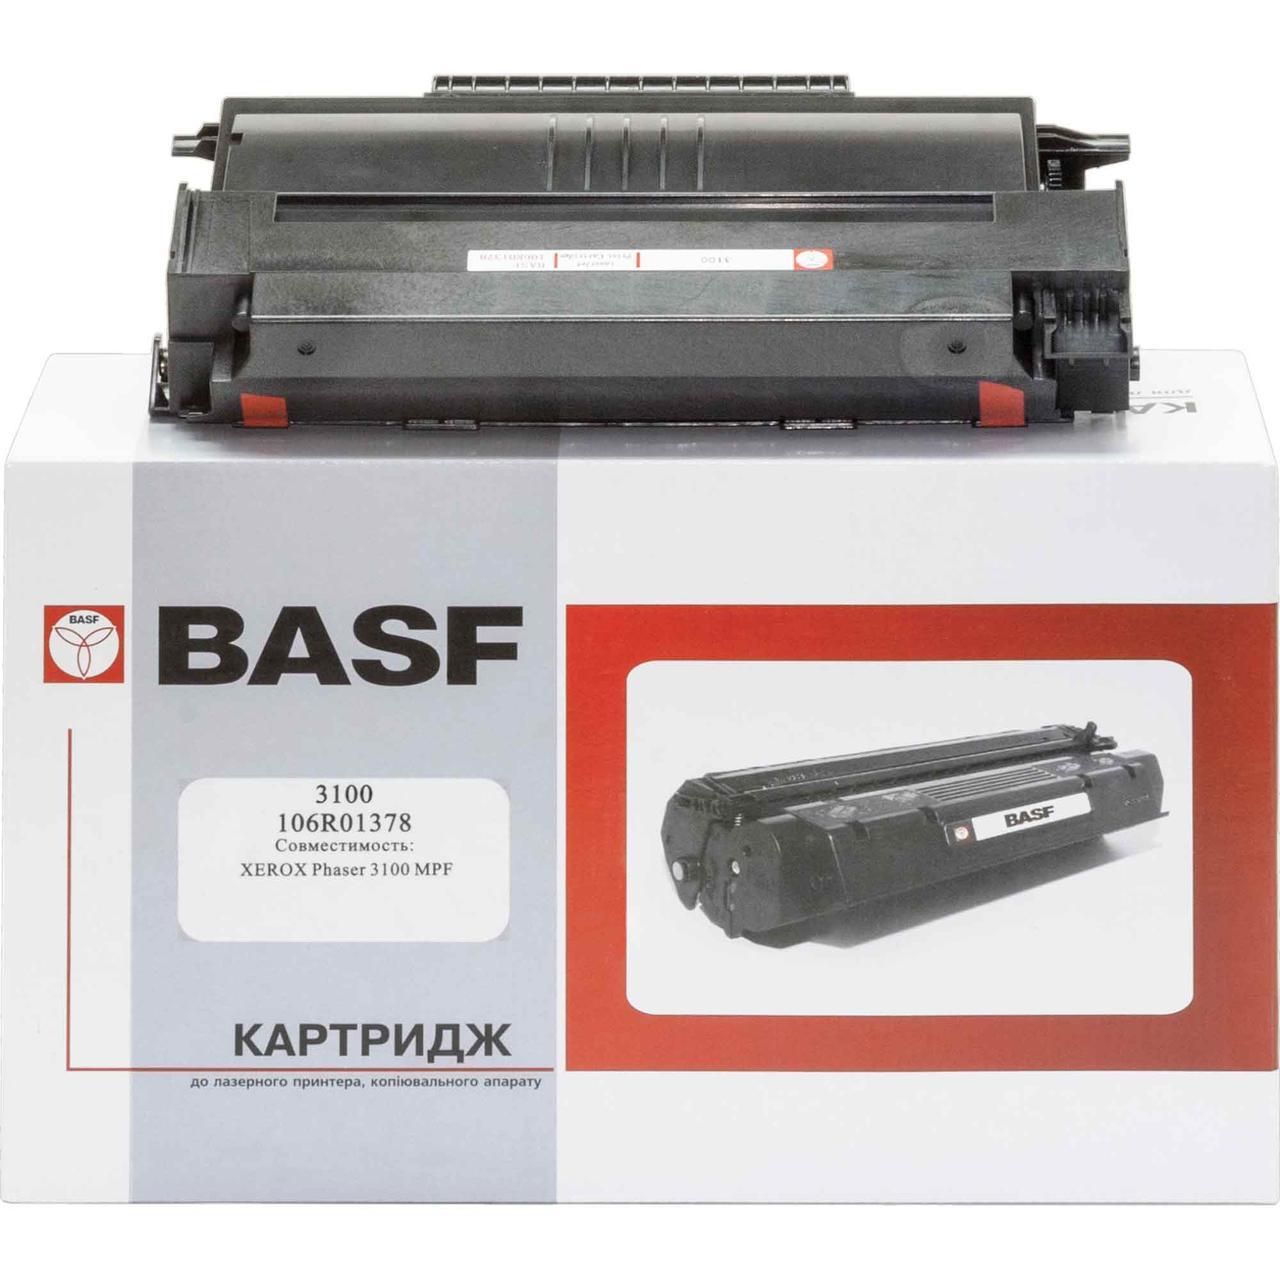 Тонер-картридж до PagePro 1480 MF/1490 MF  (Xerox Phaser 3100) BASF